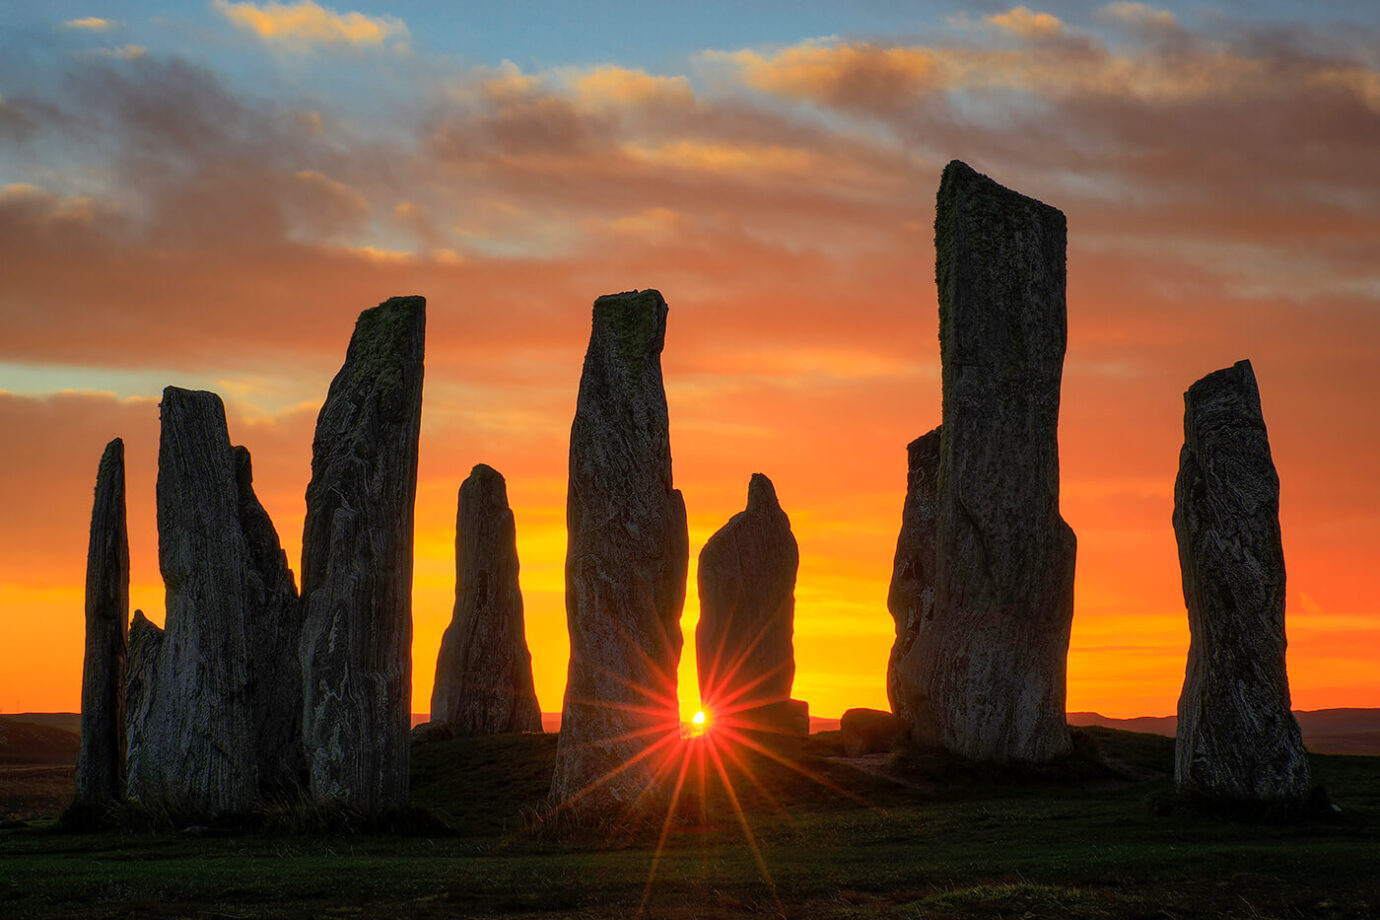 Stunning Sunrise, Callanish Standing Stones, Isle of Lewis, Outer Hebrides, Scotland